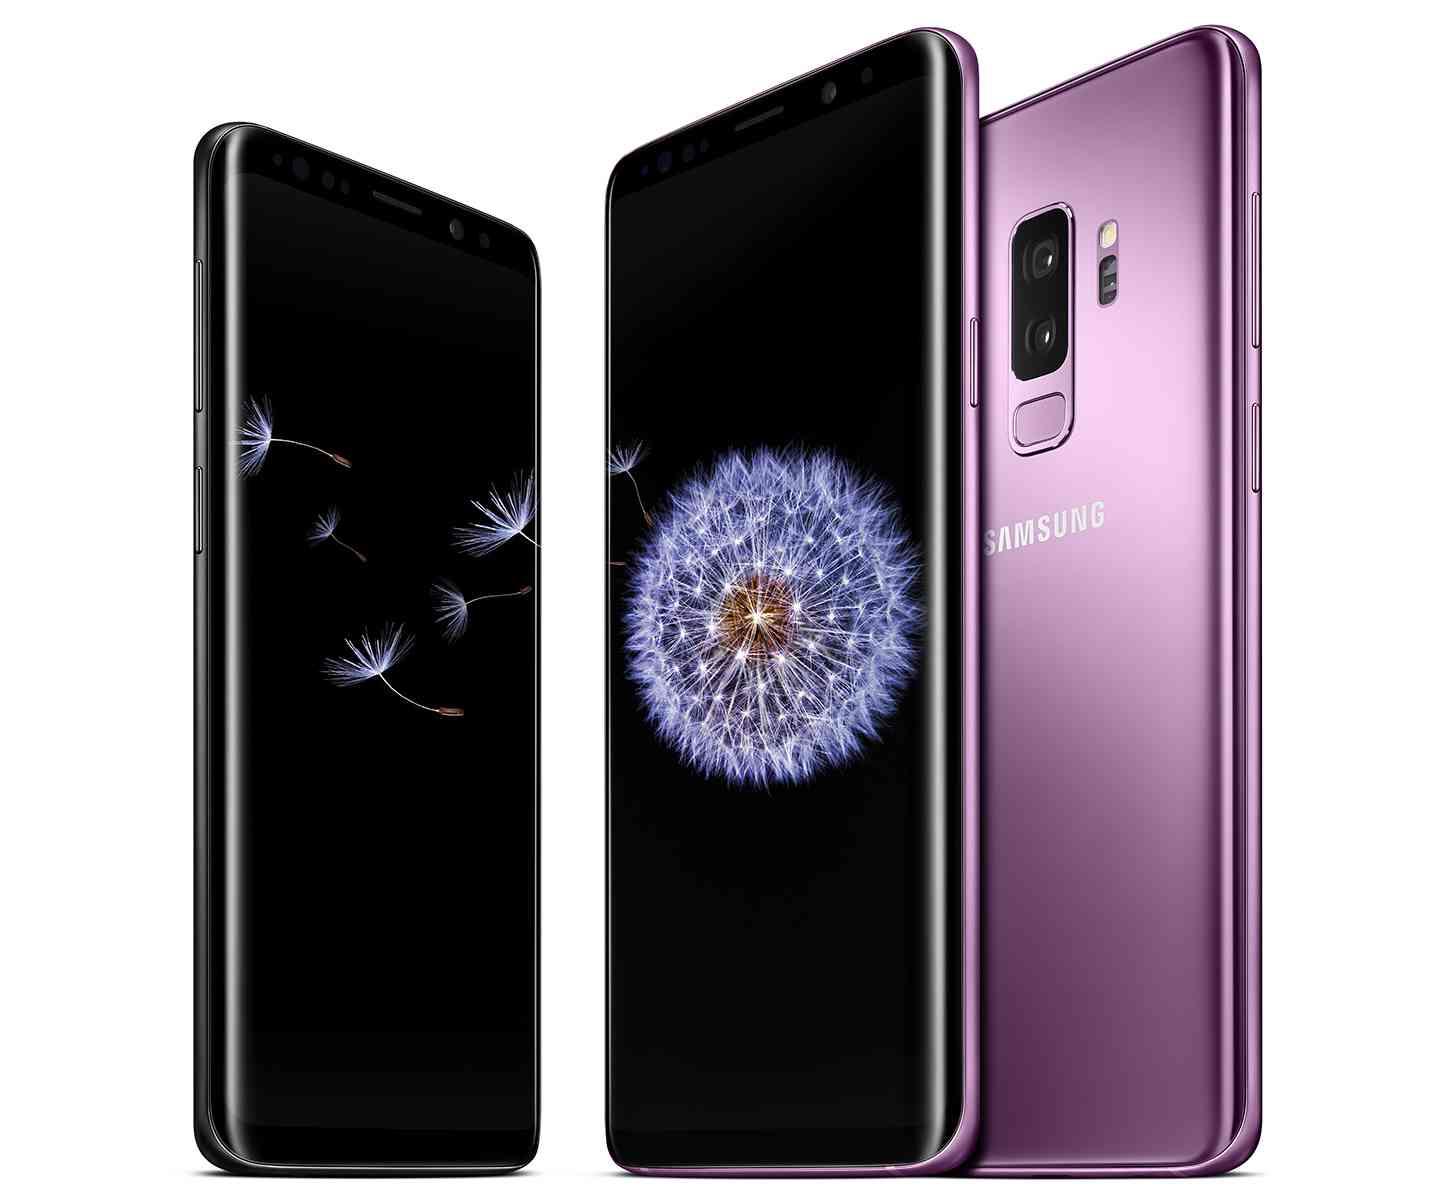 Samsung Galaxy S9, Galaxy S9+ trio